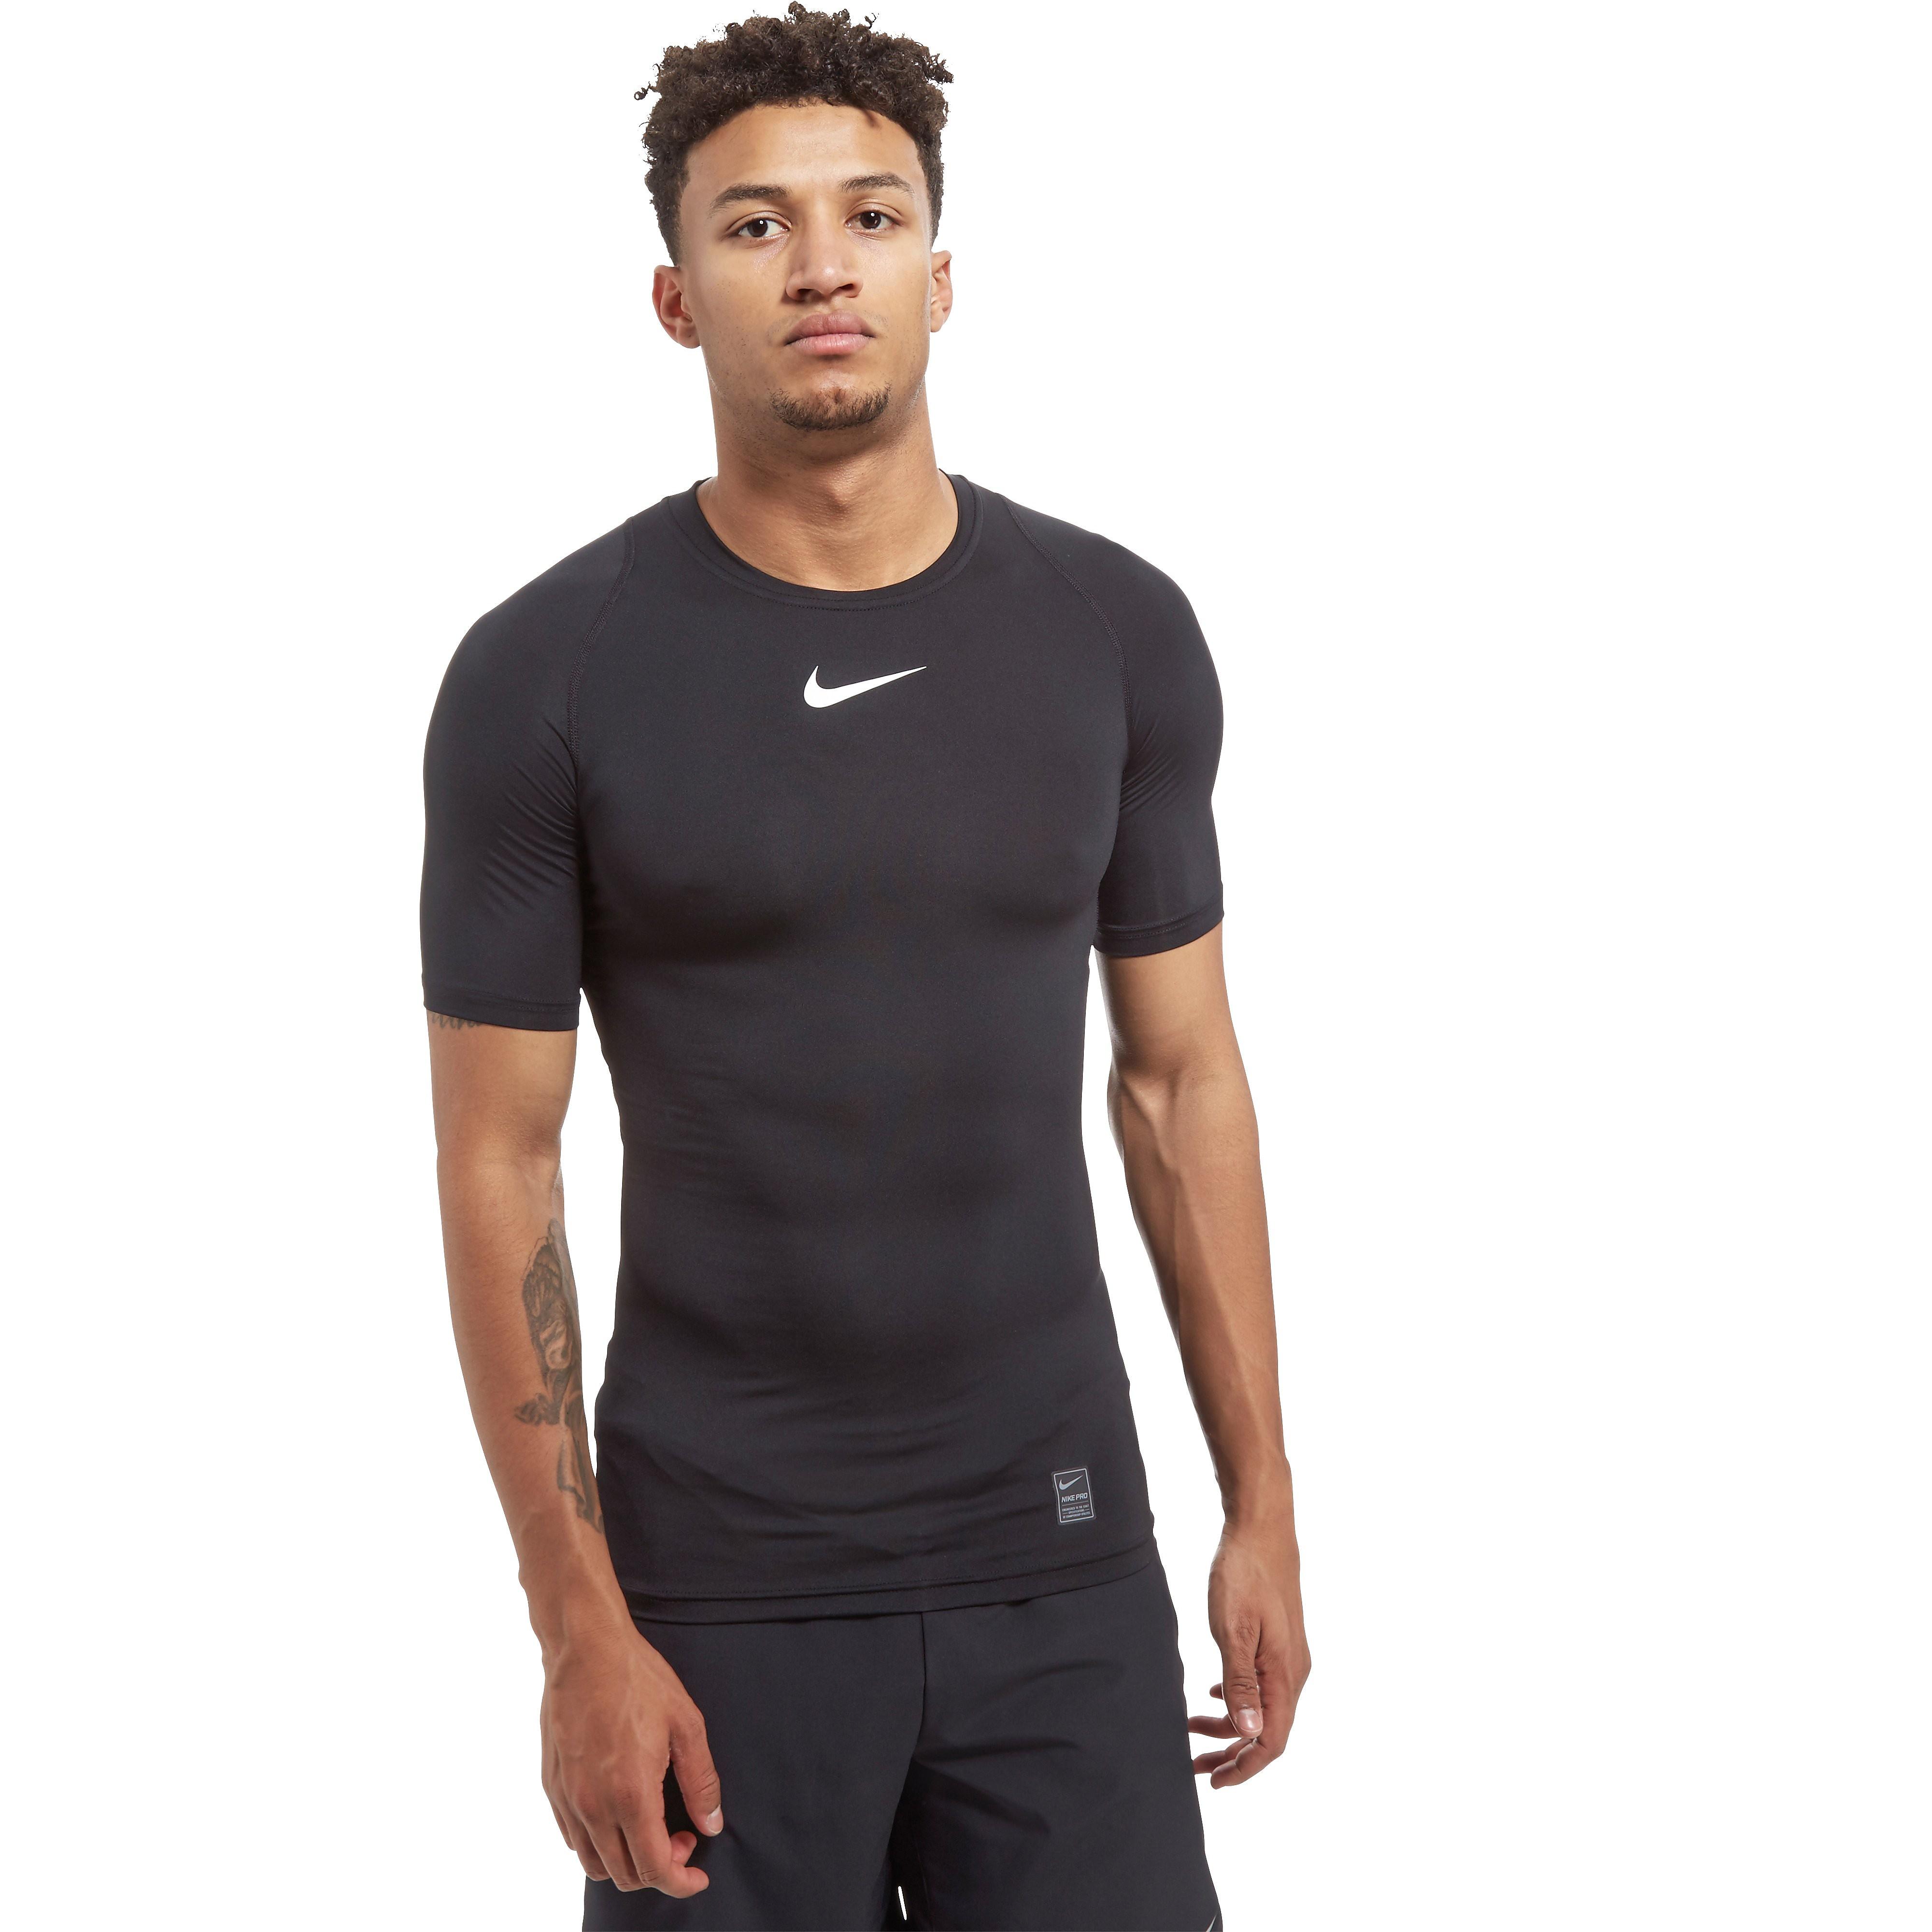 Nike Pro Compression Men's T-Shirt